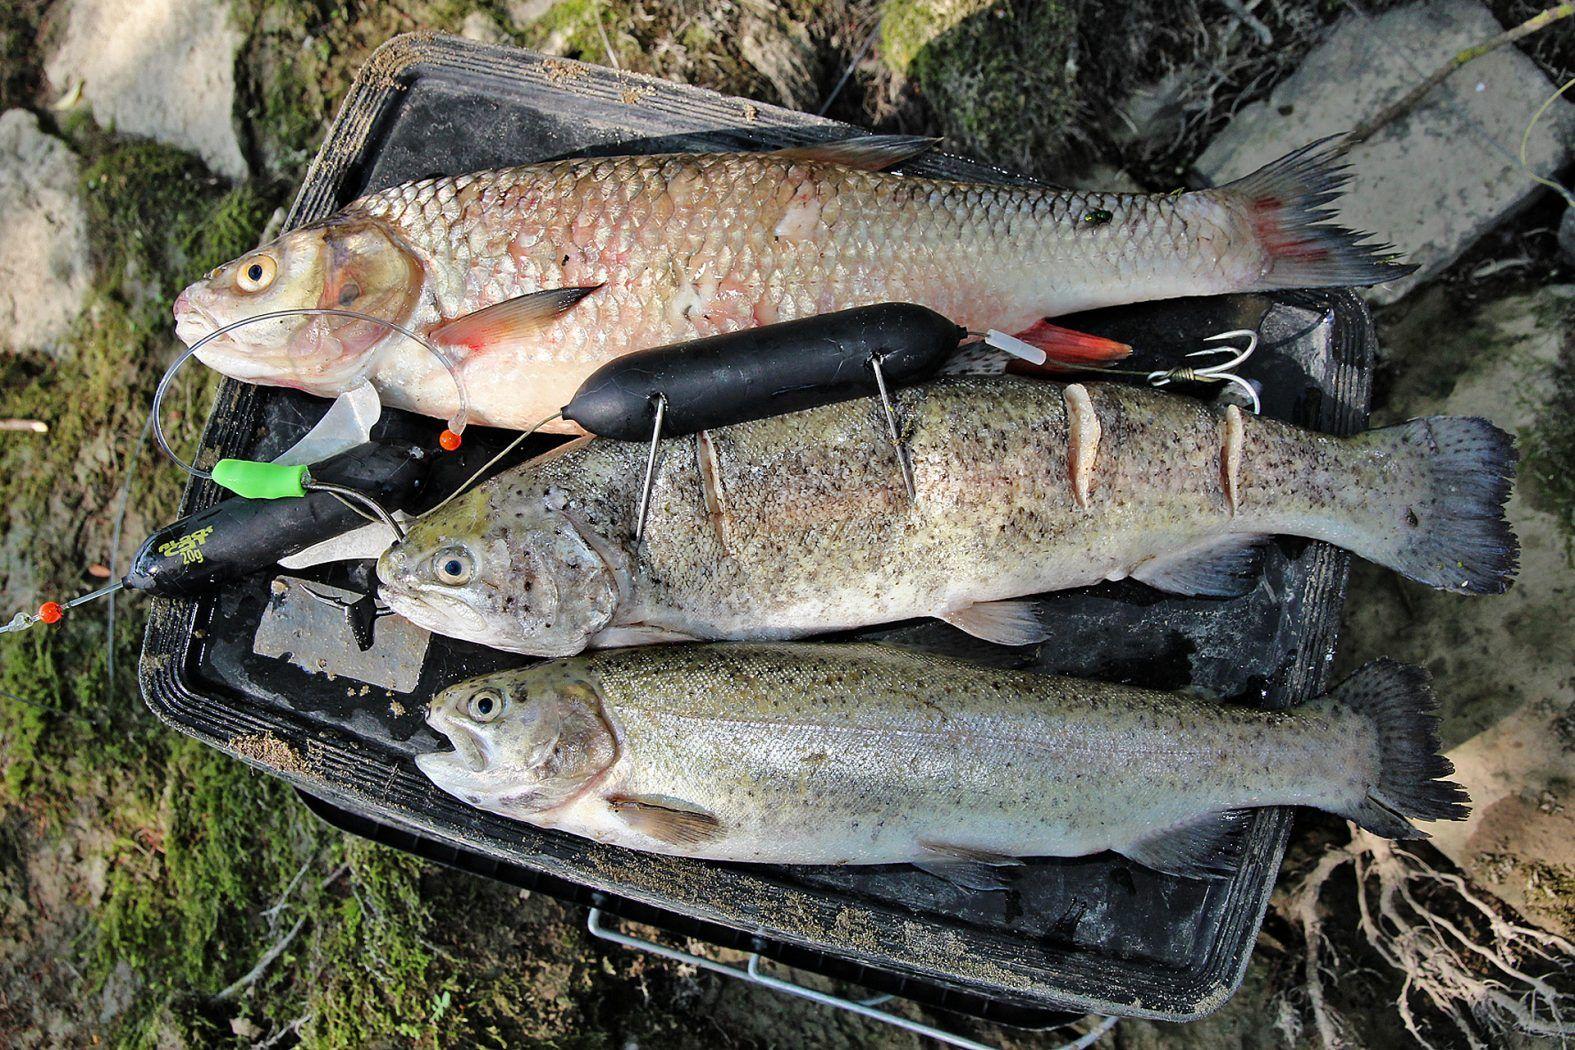 Tot, aber lebendig! | Wels angeln, Angeln, Wels